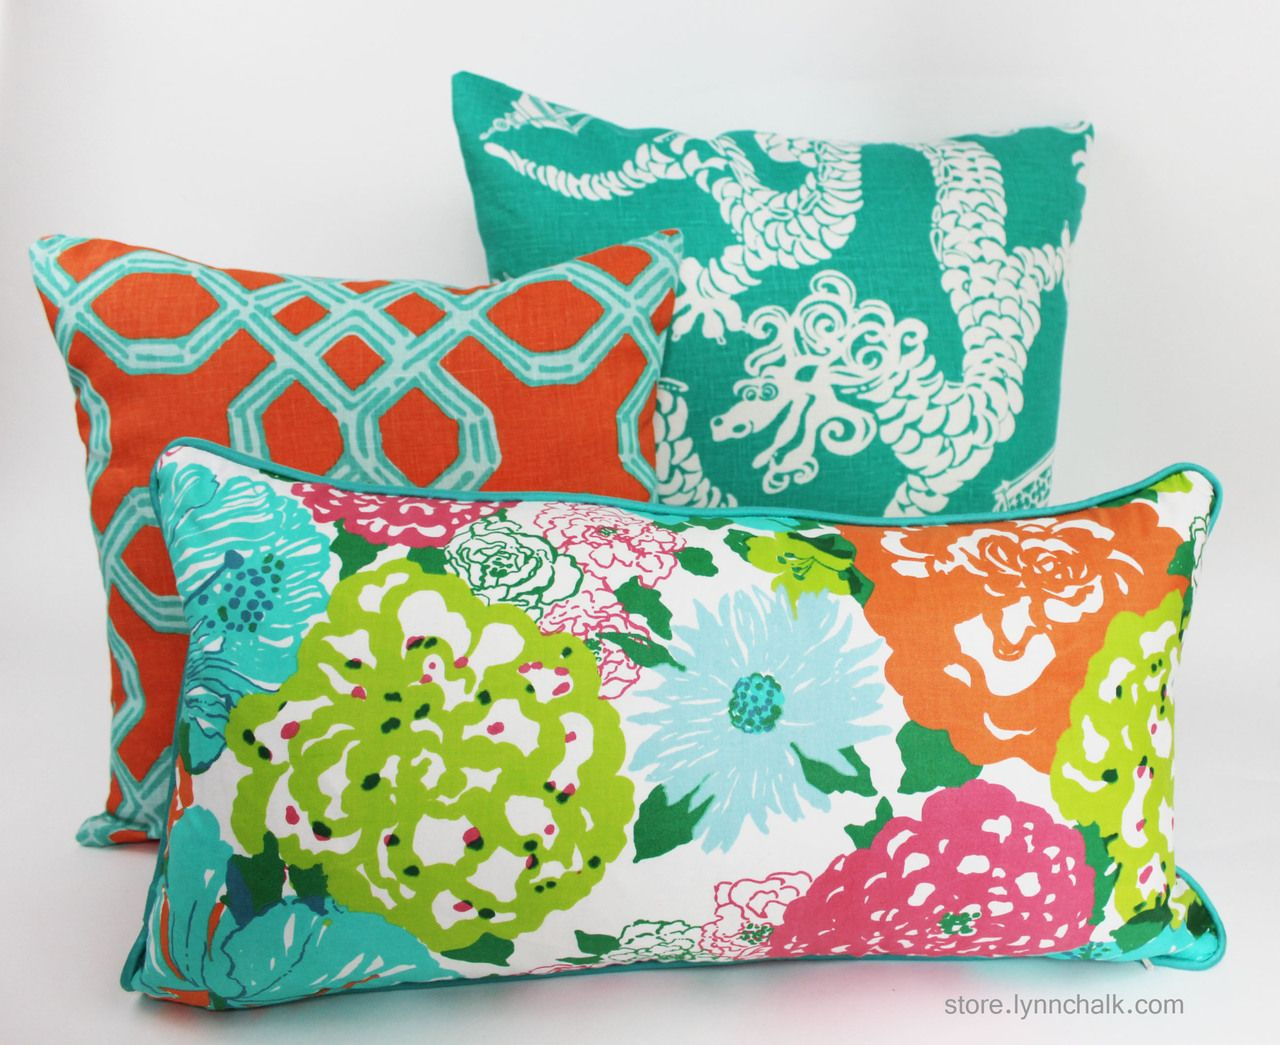 Lilly Pulitzer Pillows Pillows